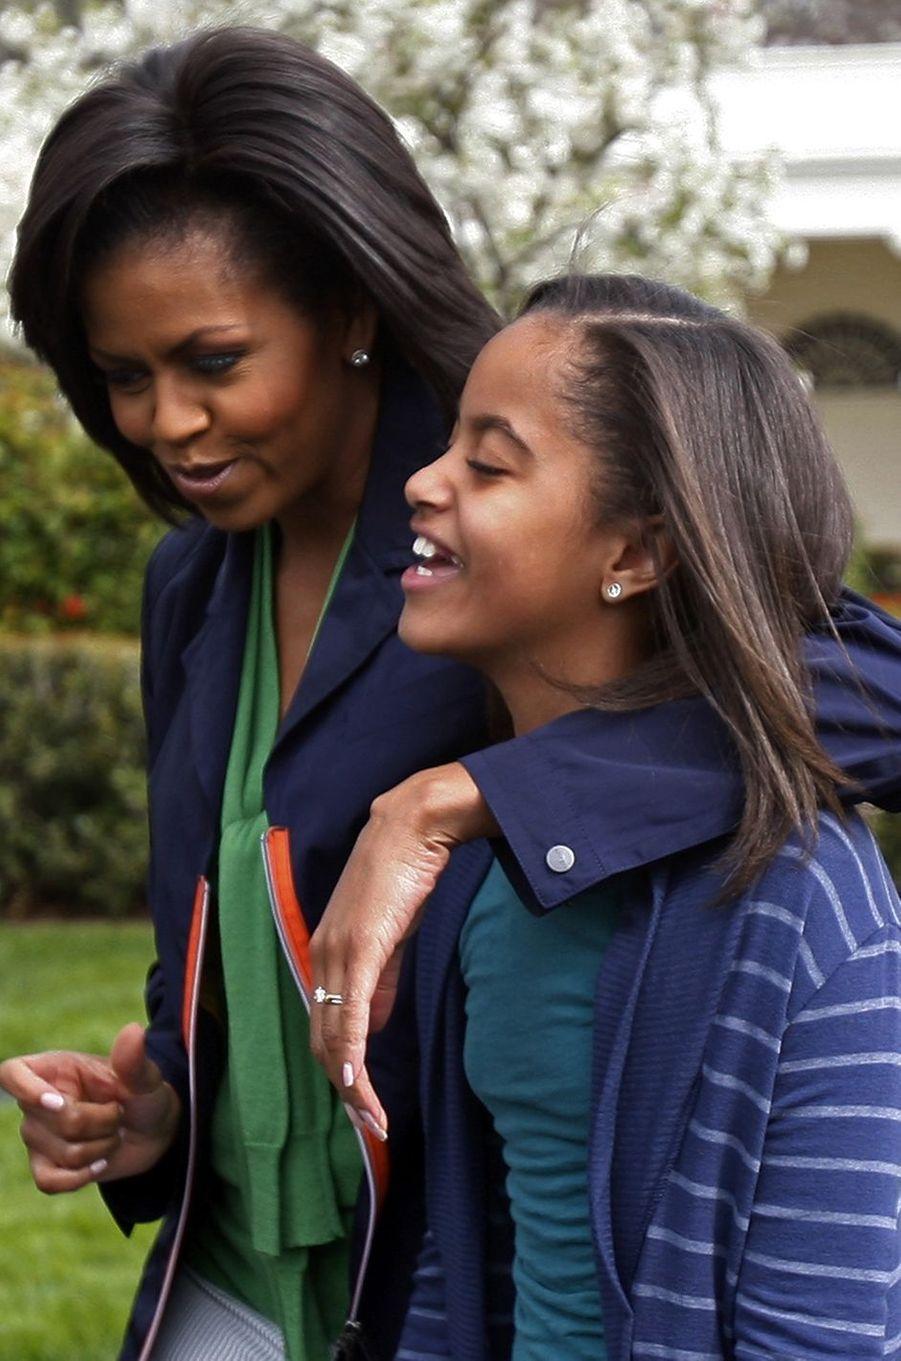 Michelle Obama et sa fille Malia, en avril 2009.